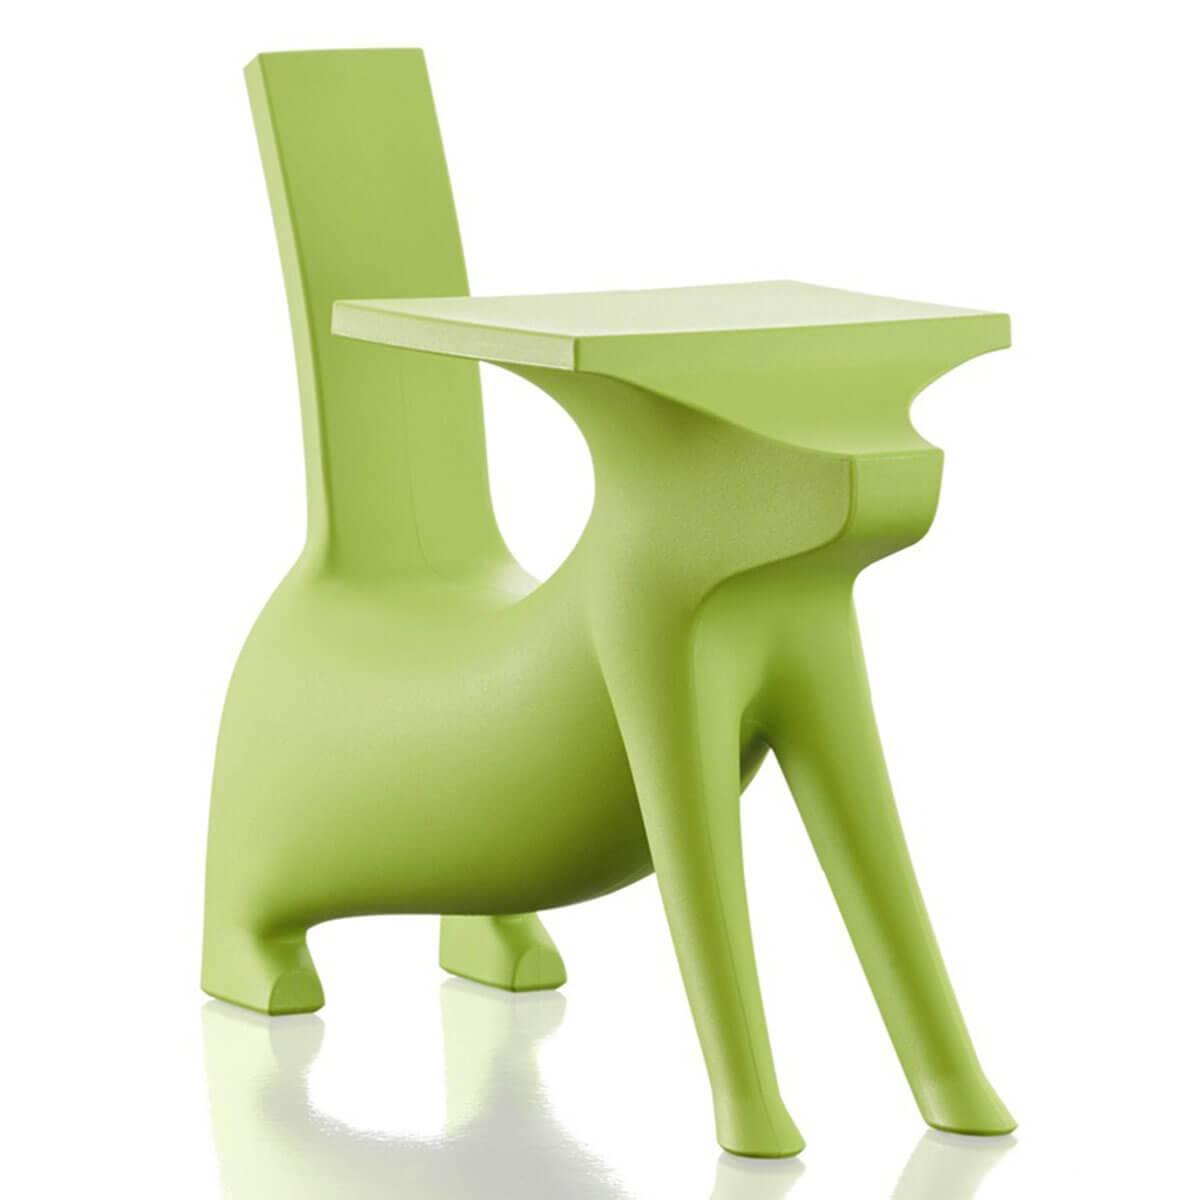 MAGIS  Le Chien Savant 儿童椅子